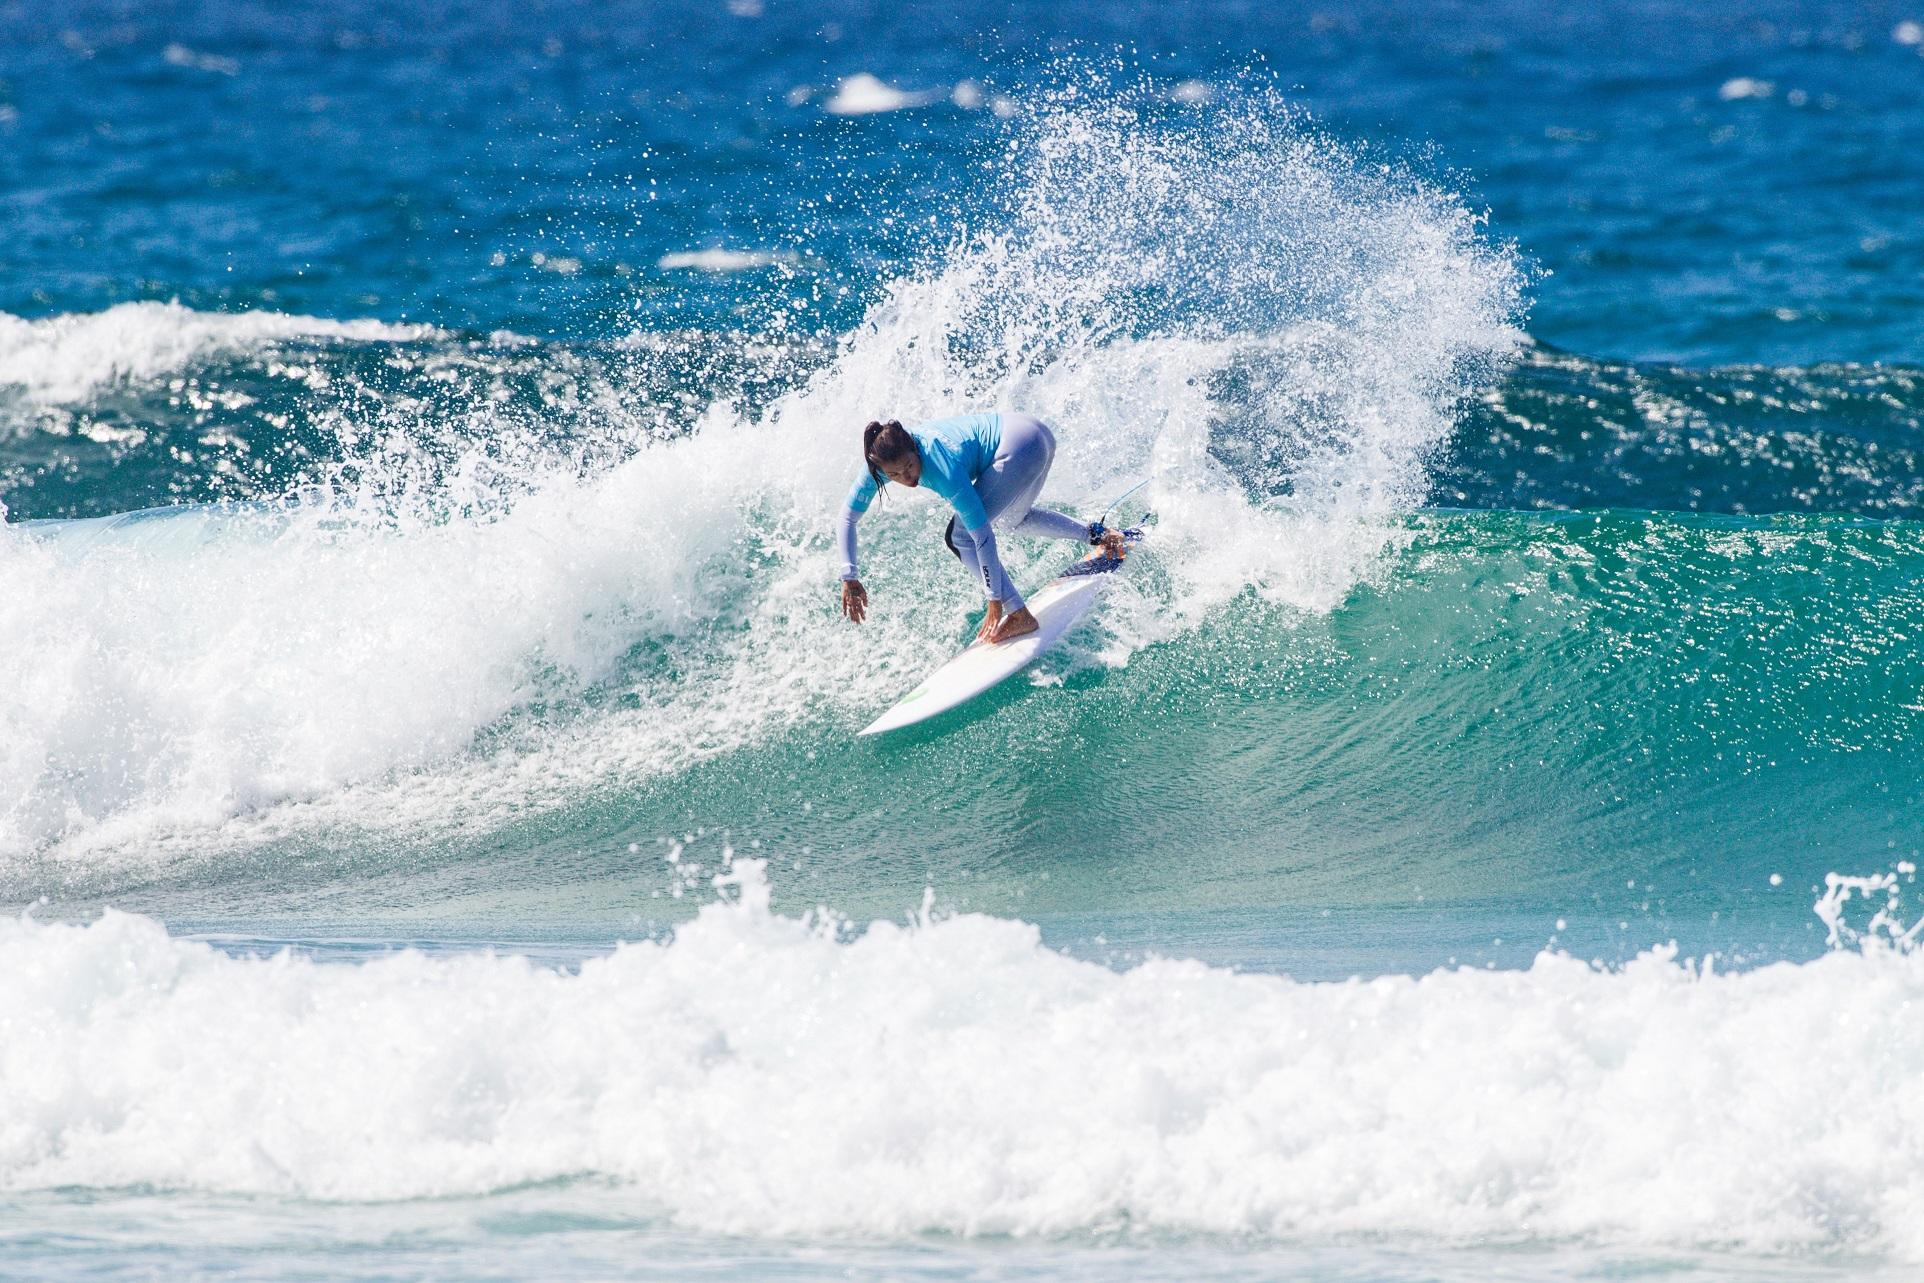 Silvana Lima-CE (Laurent Masurel / WSL via Getty Images)